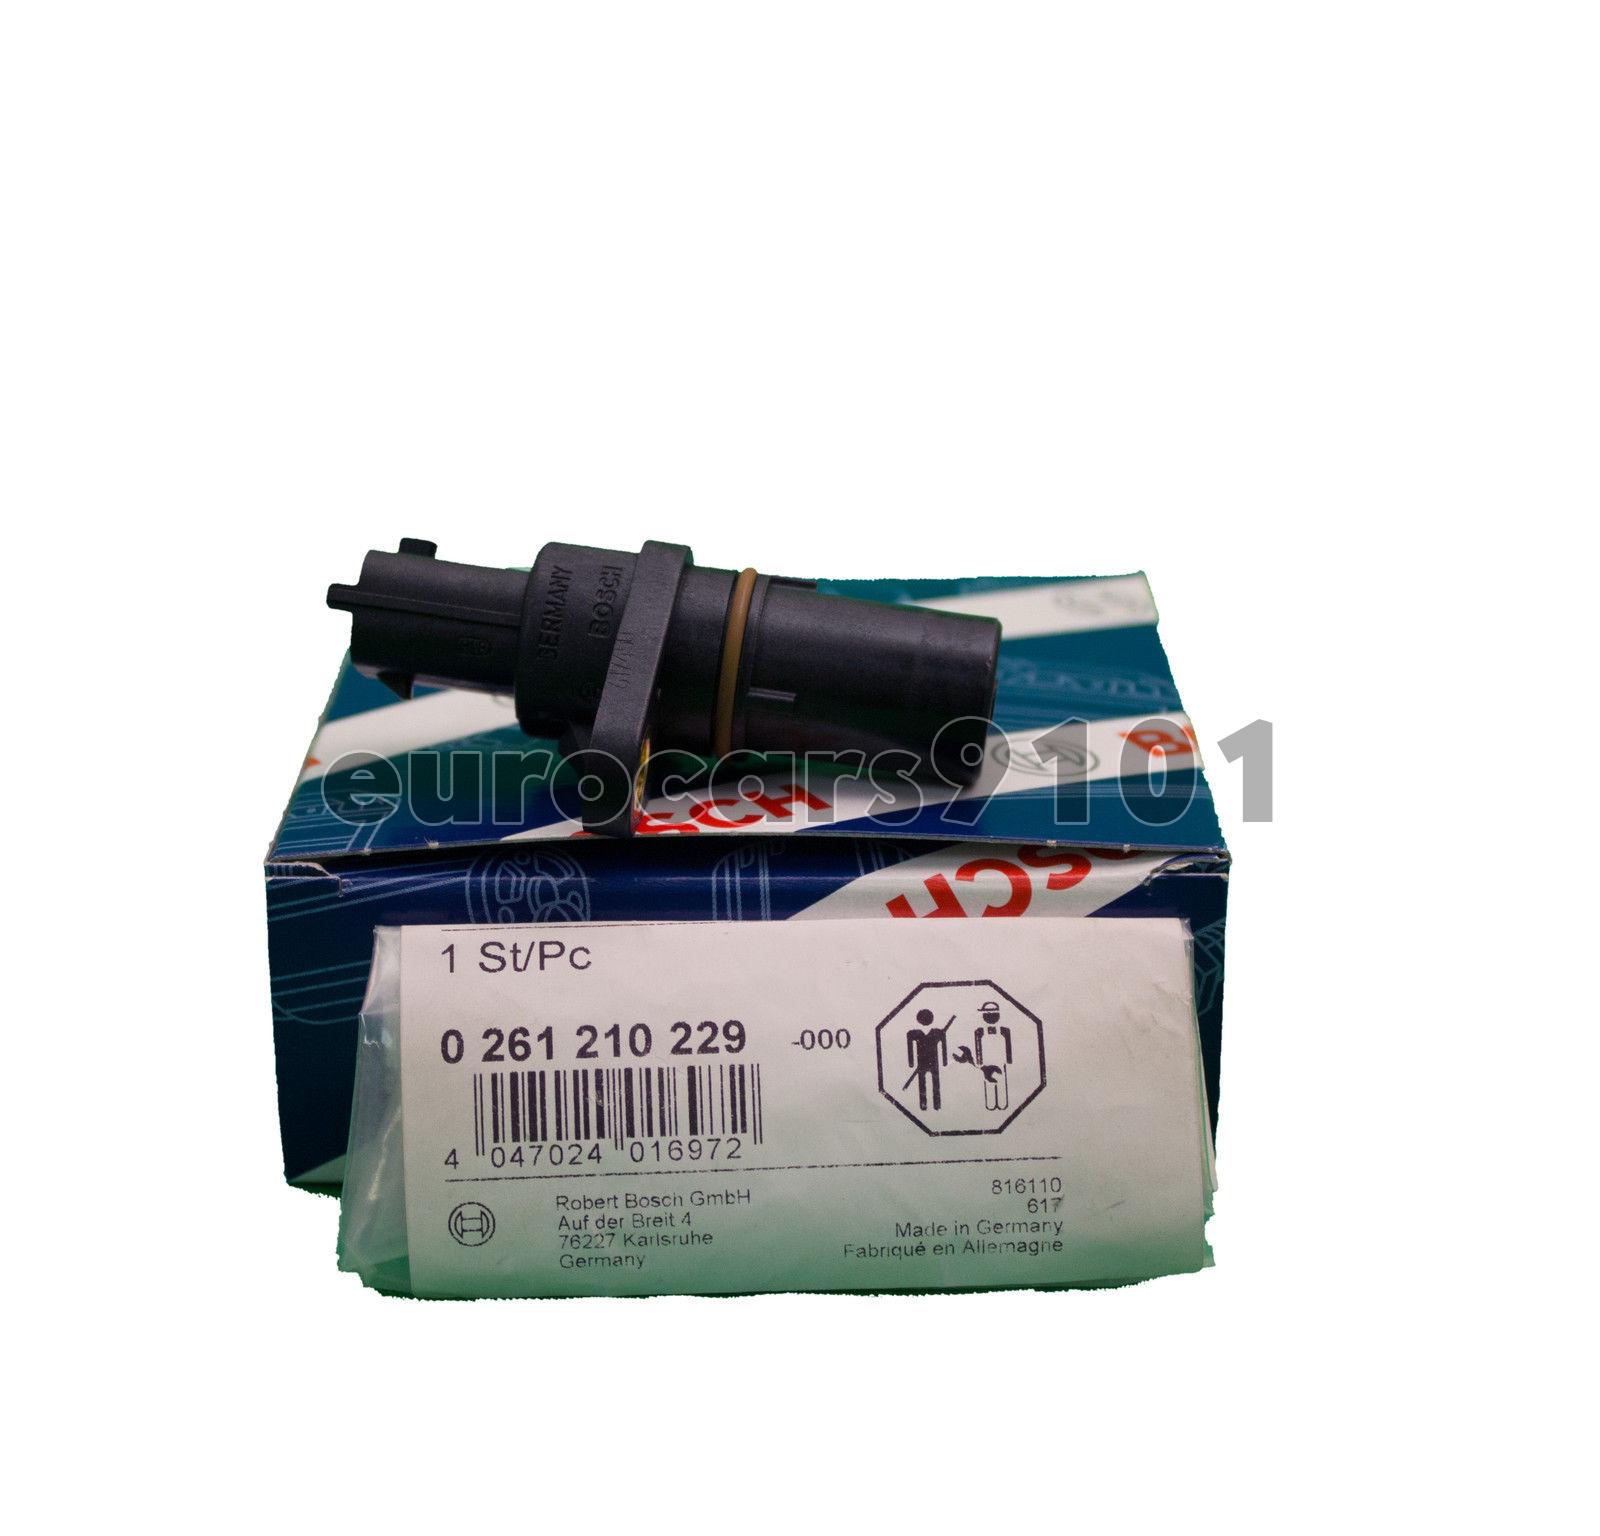 Engine Crankshaft Position Sensor-Crank Angle Sensor Bosch 0261210229